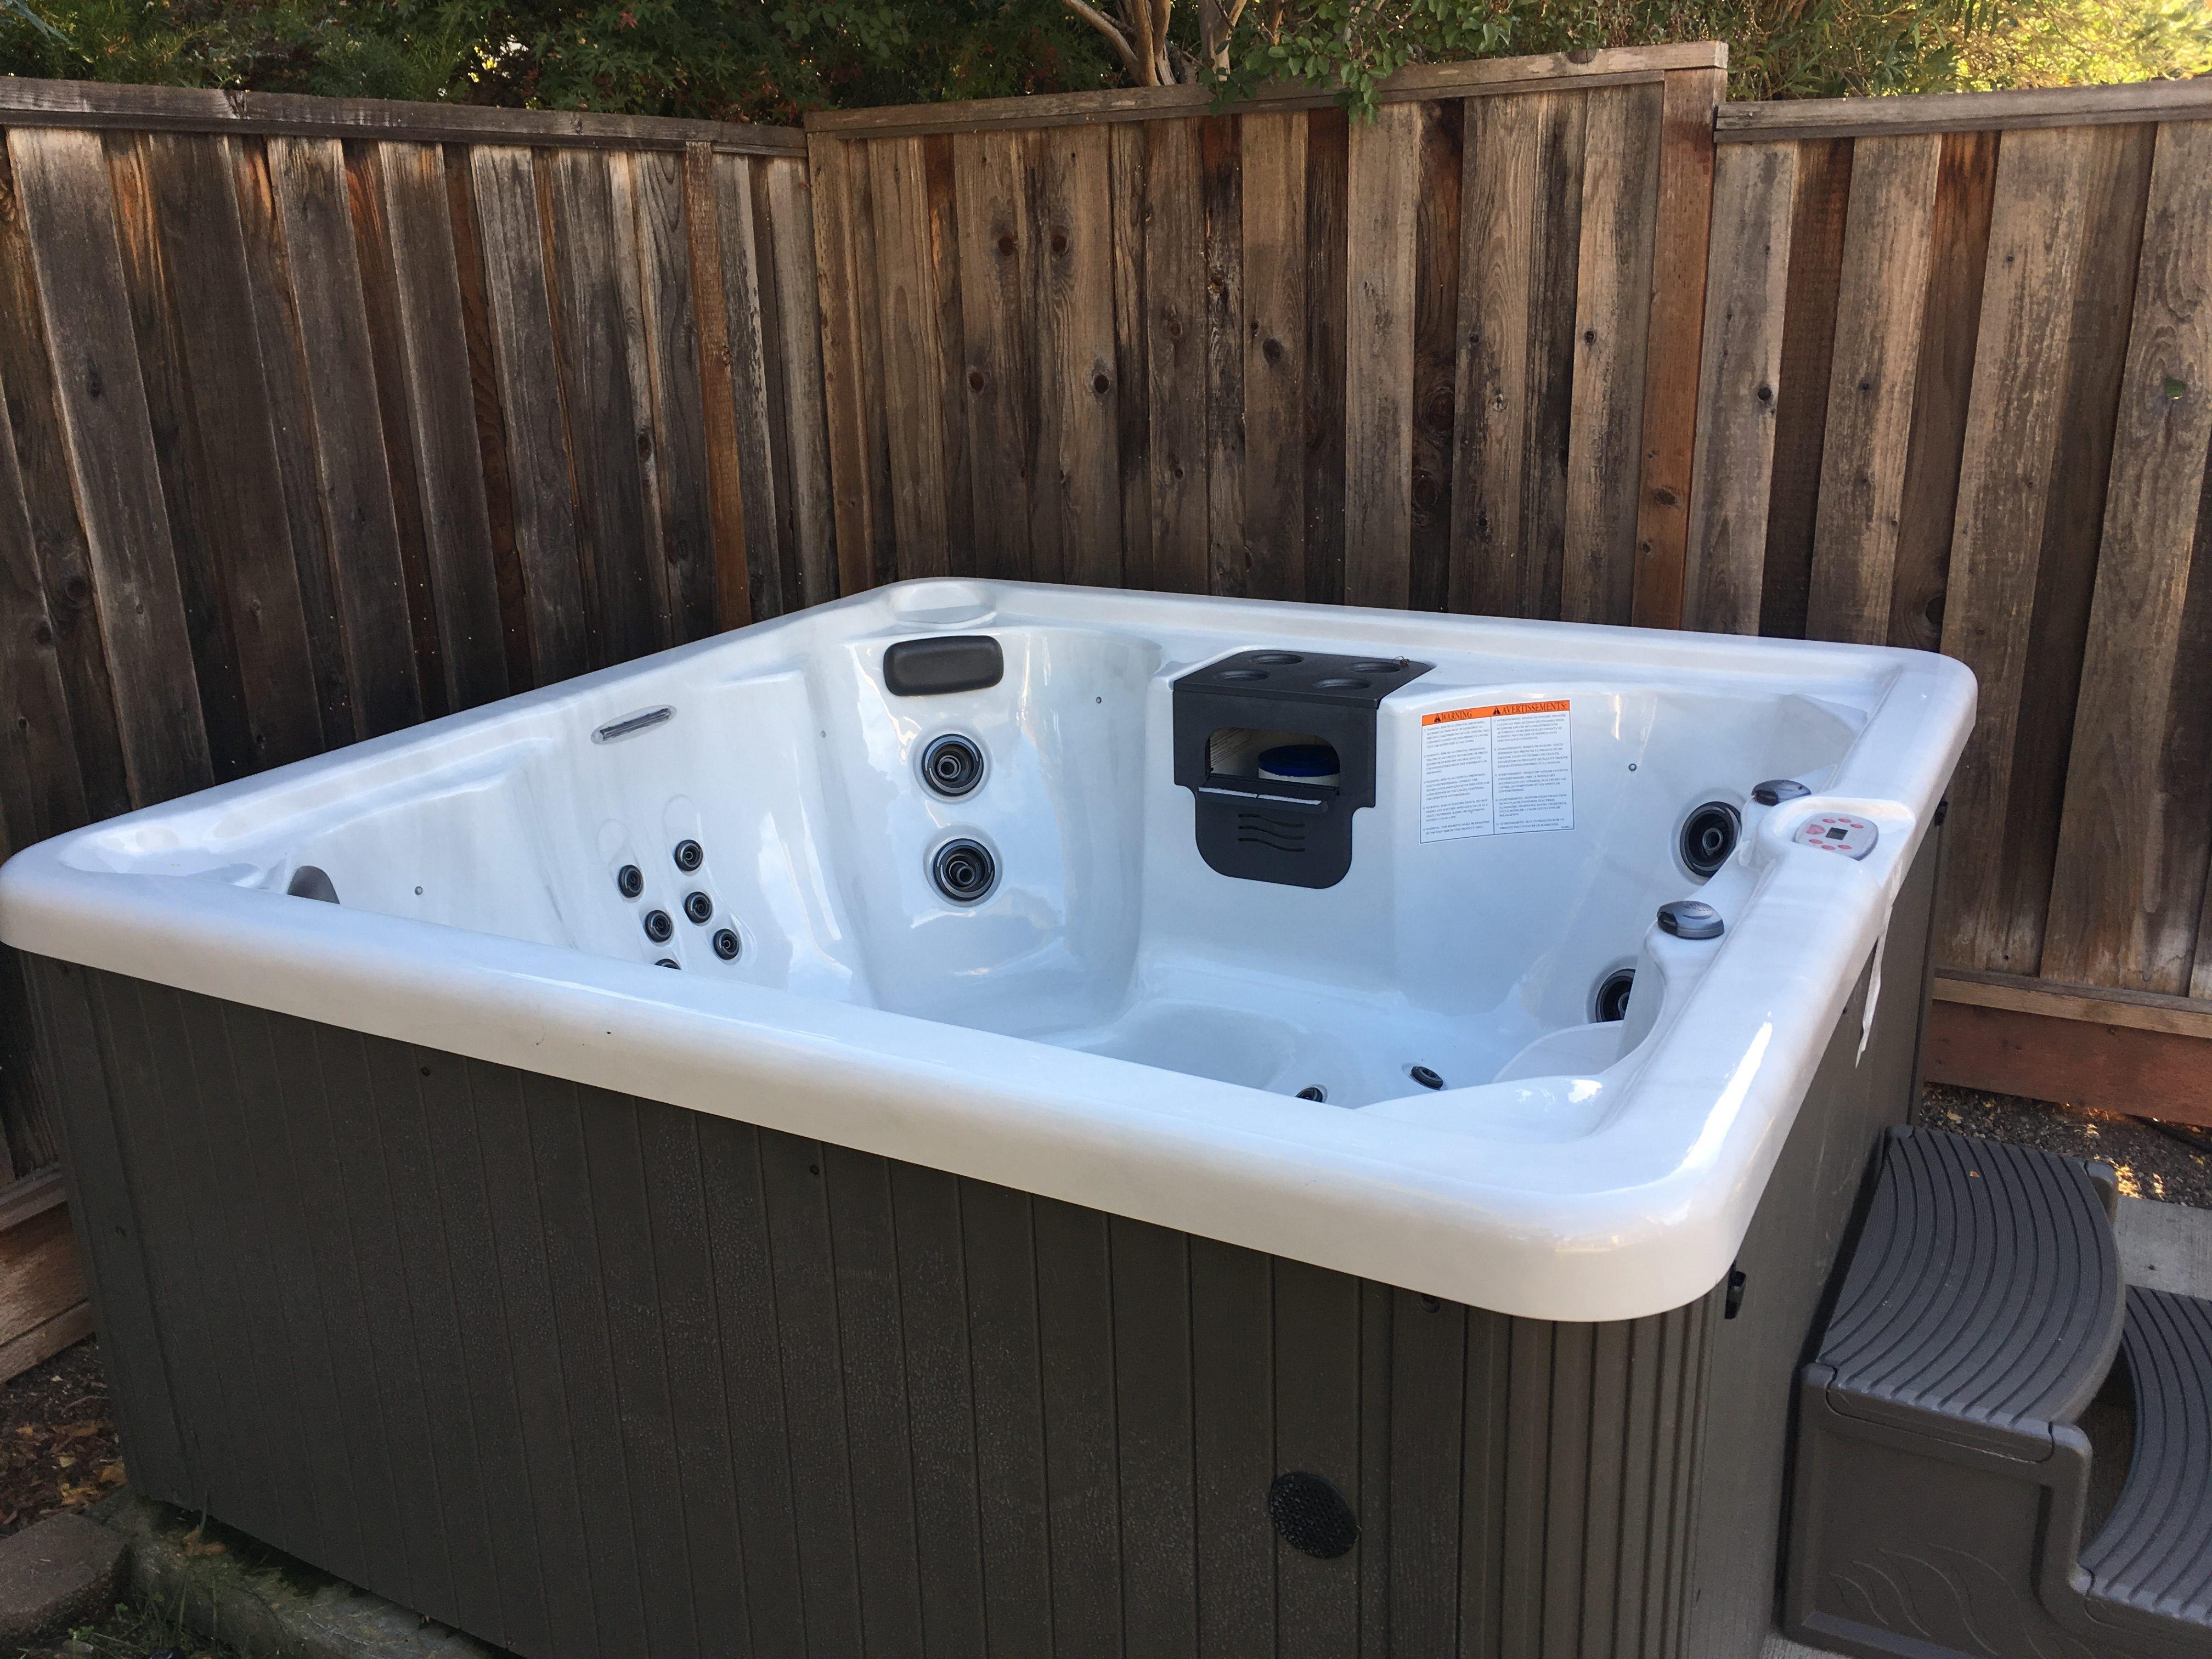 2018 Whirlpool Master Spa Hot Tub – $6400 (gilroy)